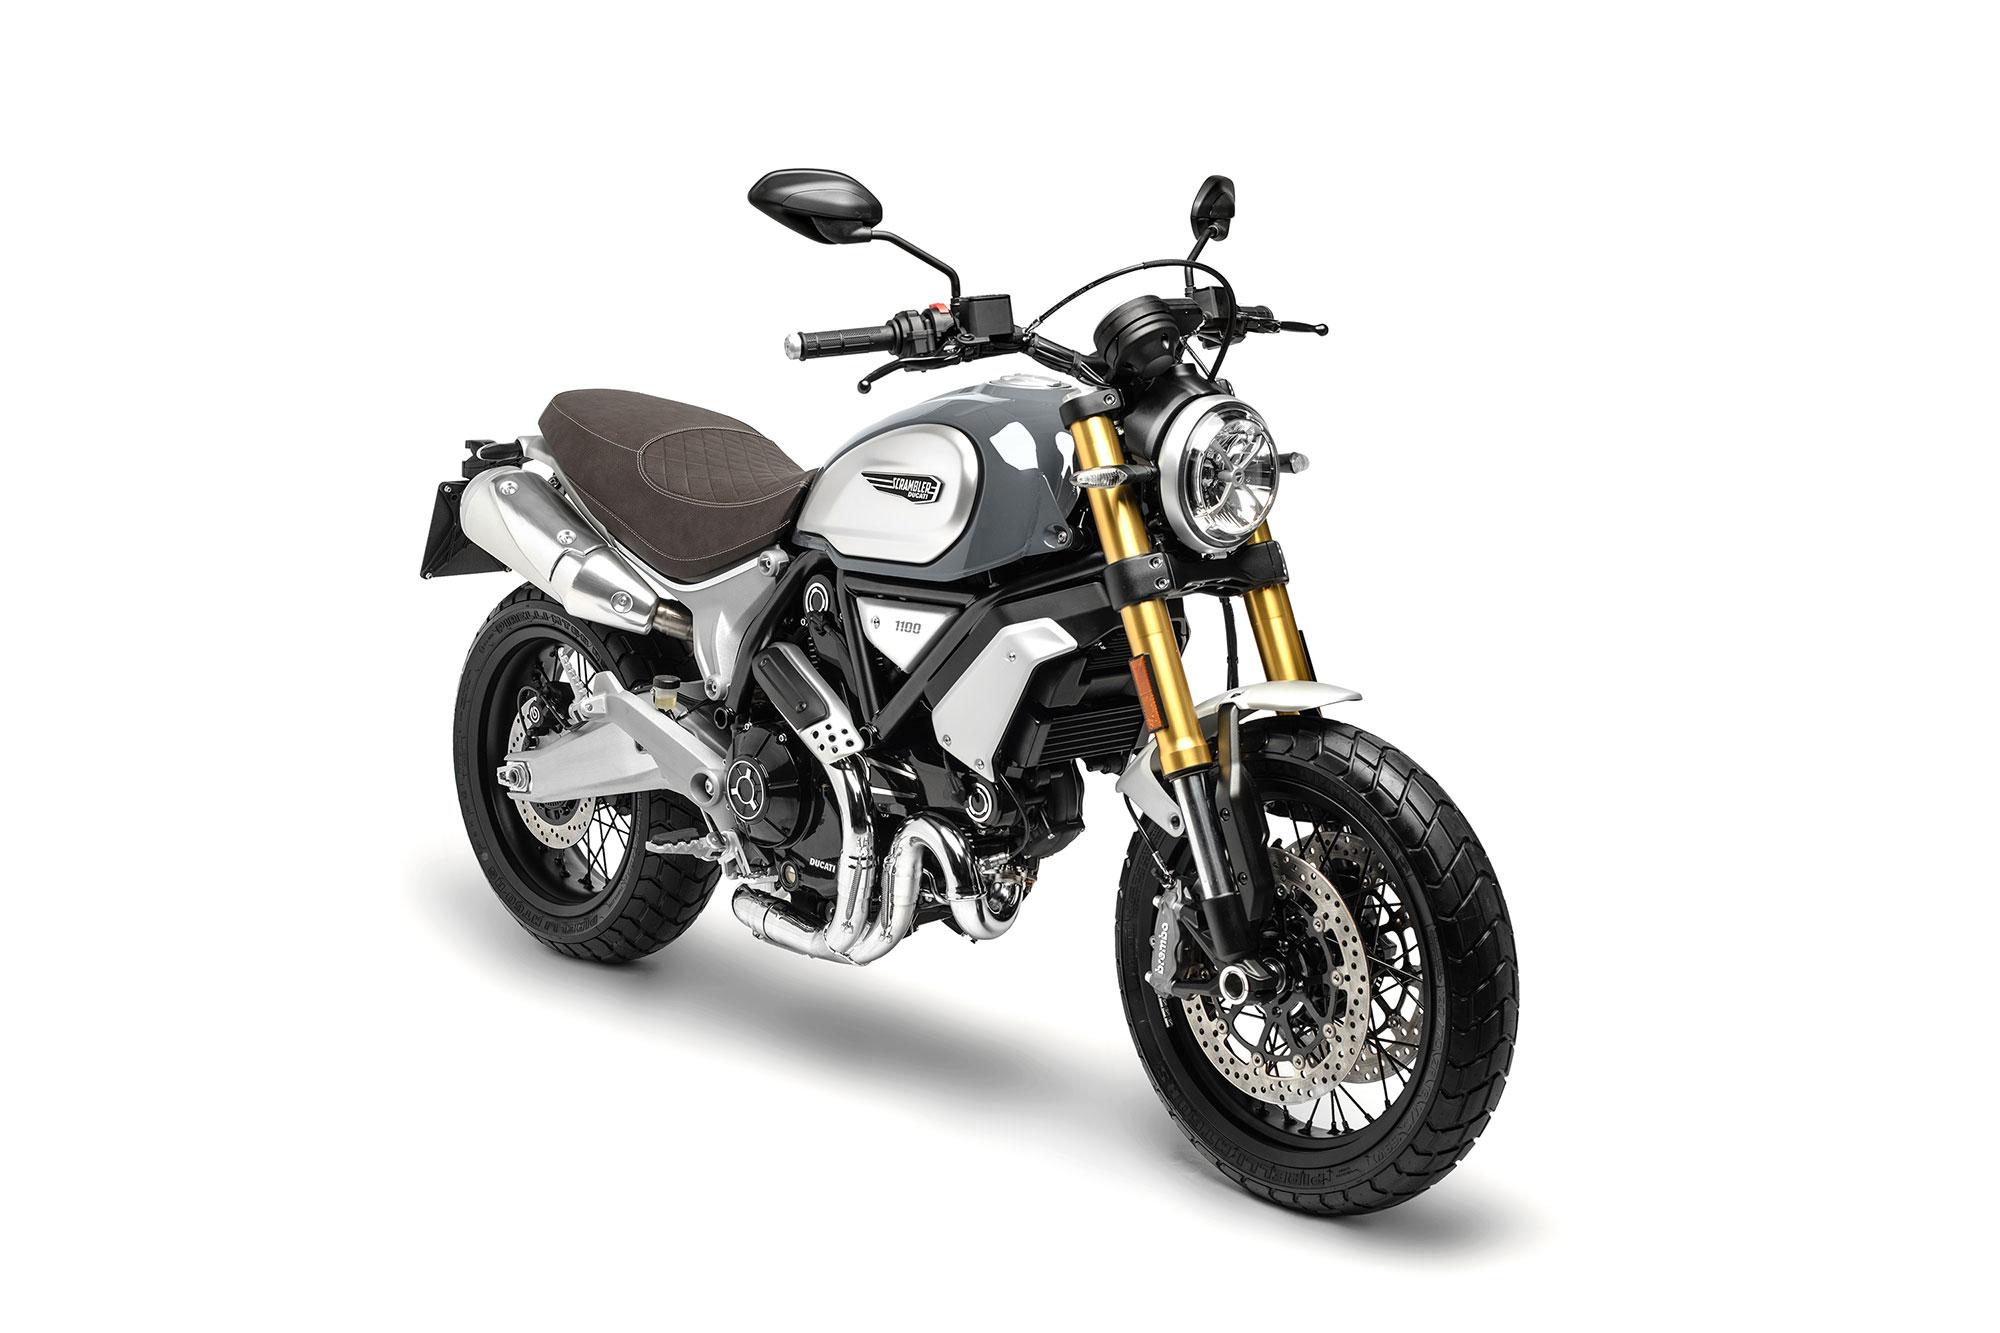 МОТОЦИКЛ DUCATI SCRAMBLER 1100 SPECIAL ― Артмото - купить квадроцикл в украине и харькове, мотоцикл, снегоход, скутер, мопед, электромобиль